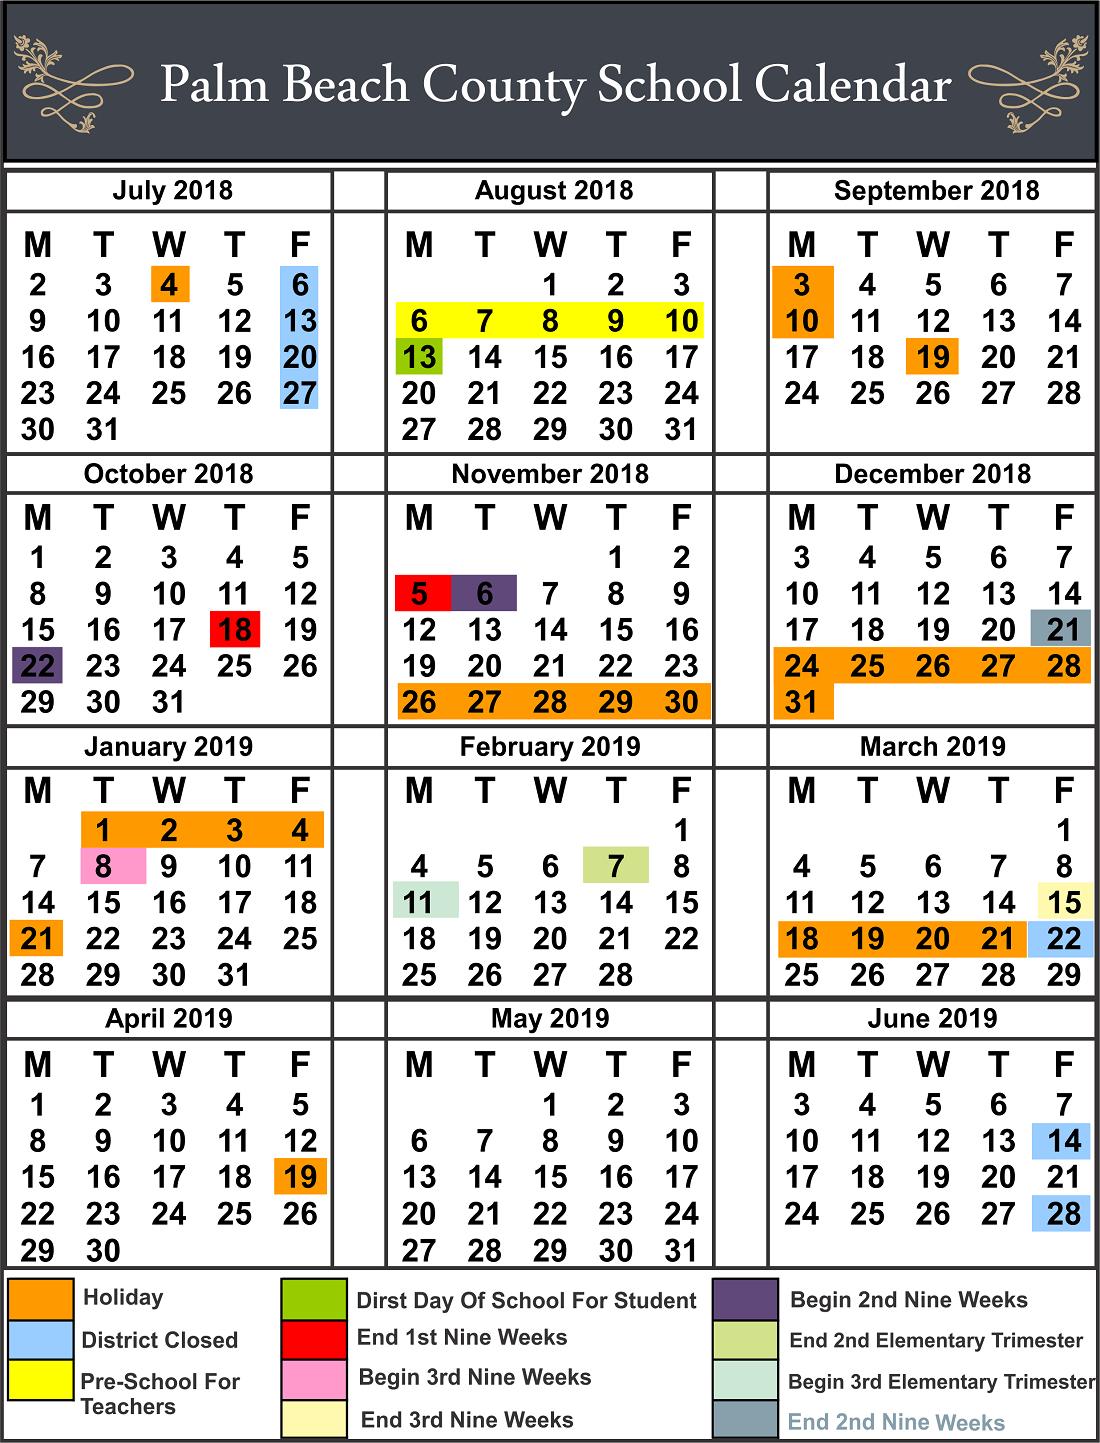 Uri Academic Calendar 2021 | Printable Calendar 2020-2021 throughout Mifflin County School District Calendar